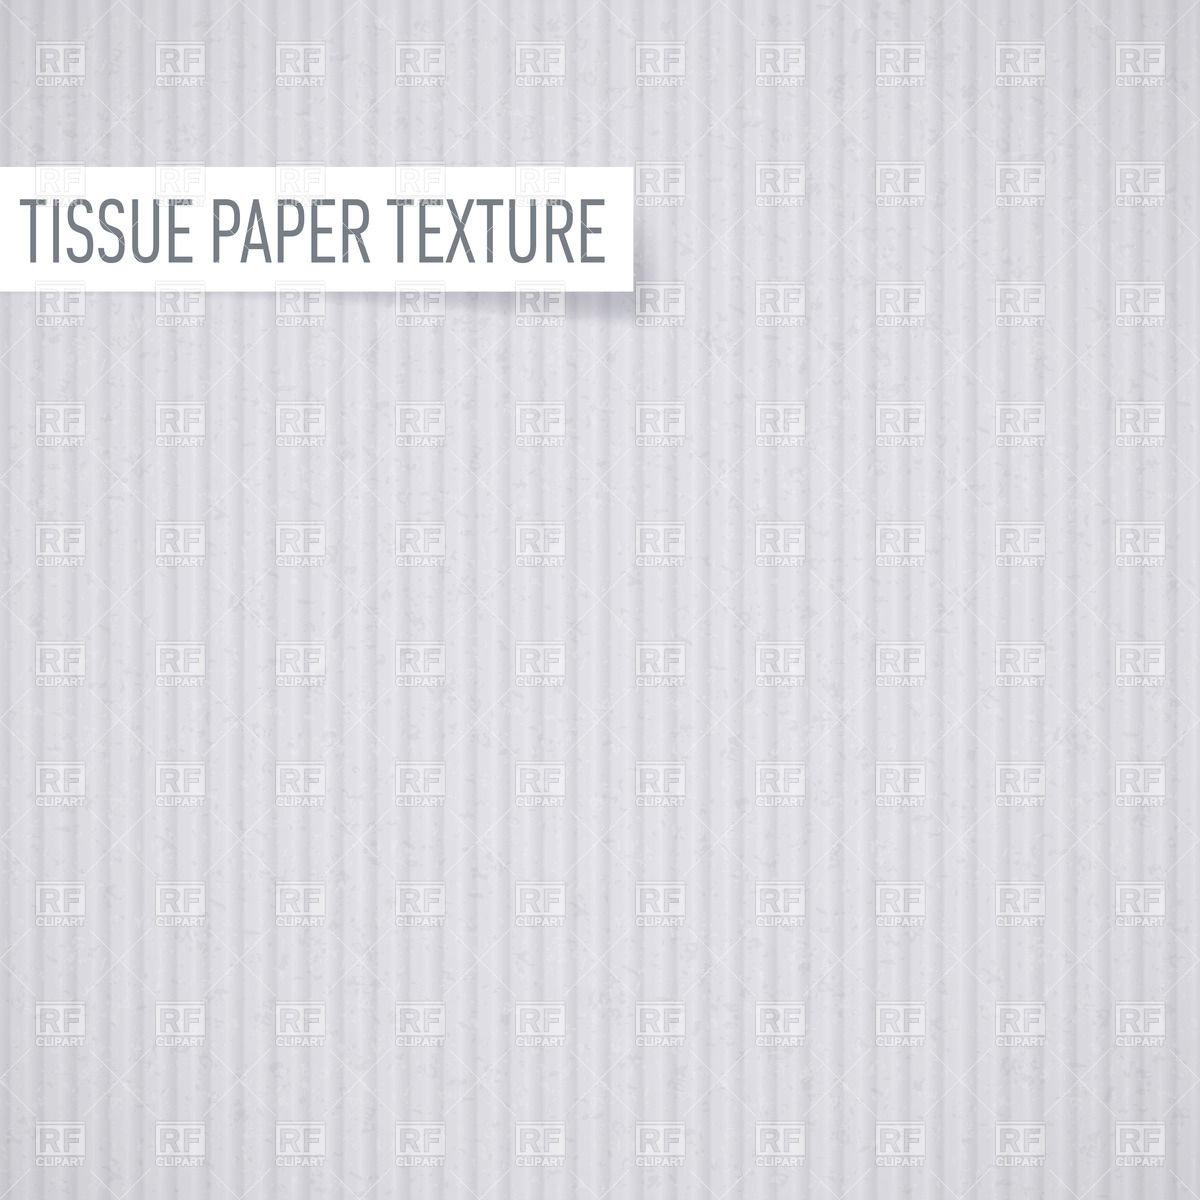 Paper texture clipart #13